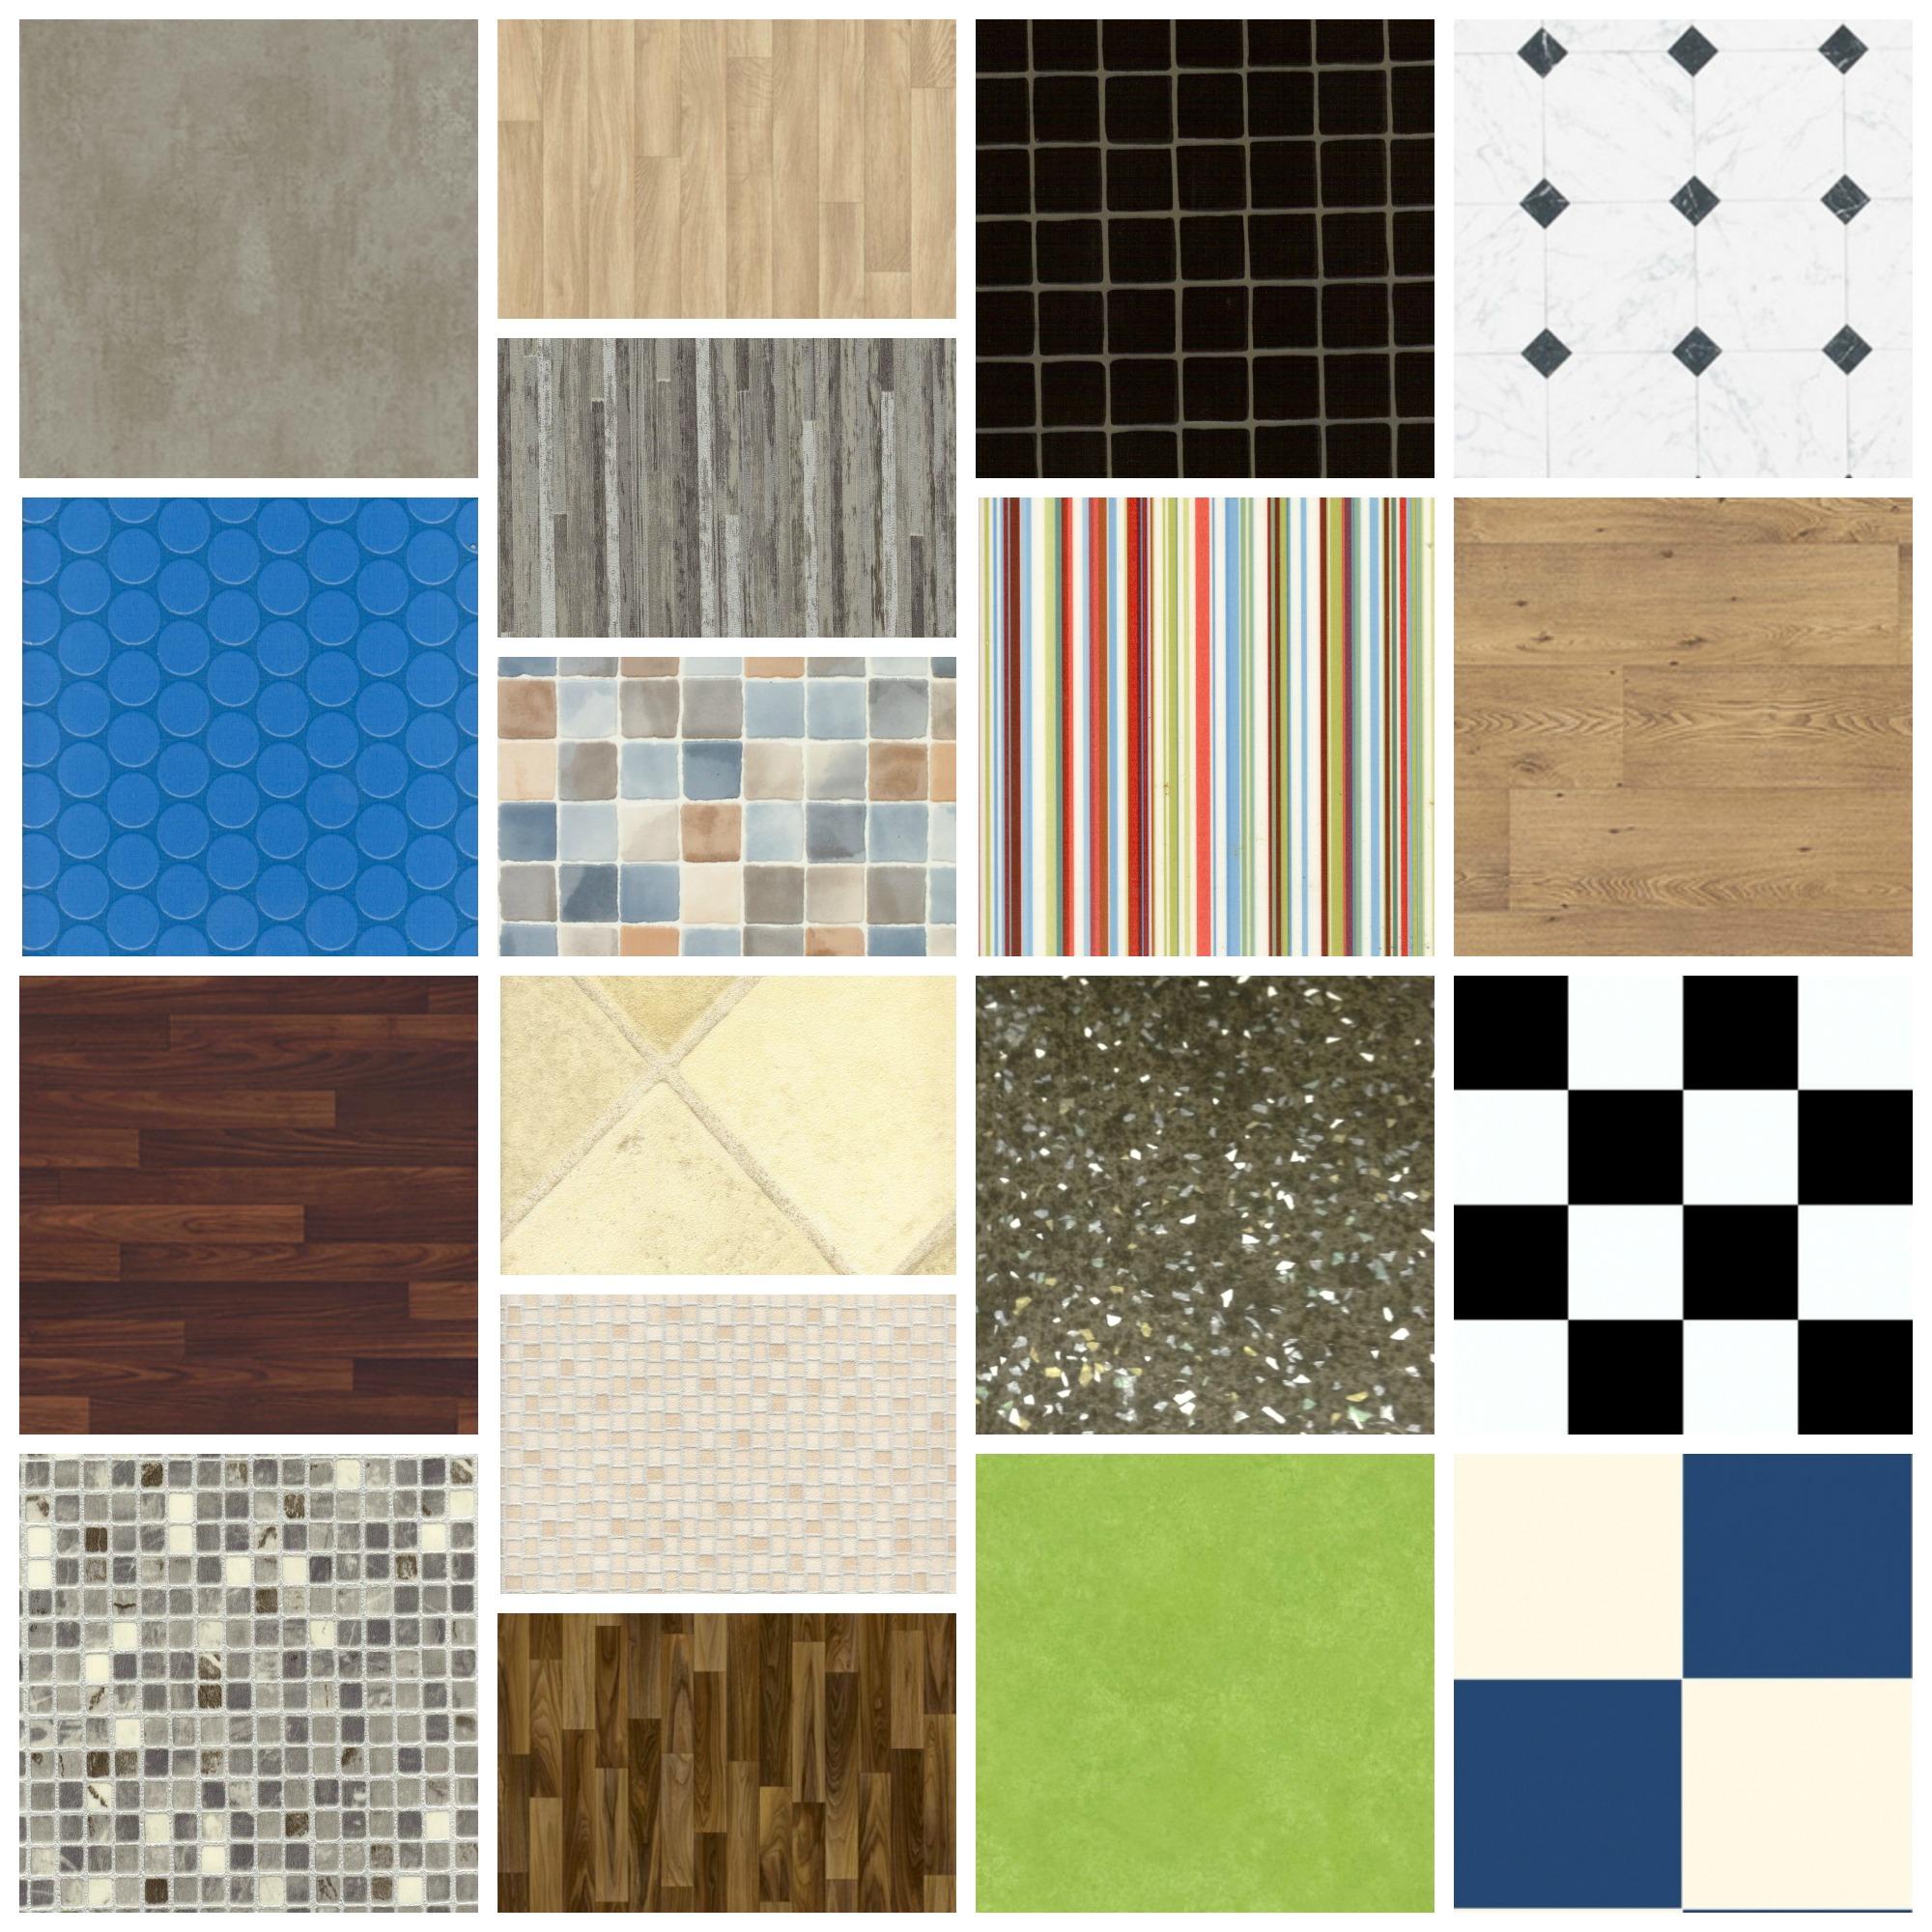 Cushion Floor Amp Vinyl The Carpet Shop North Shields